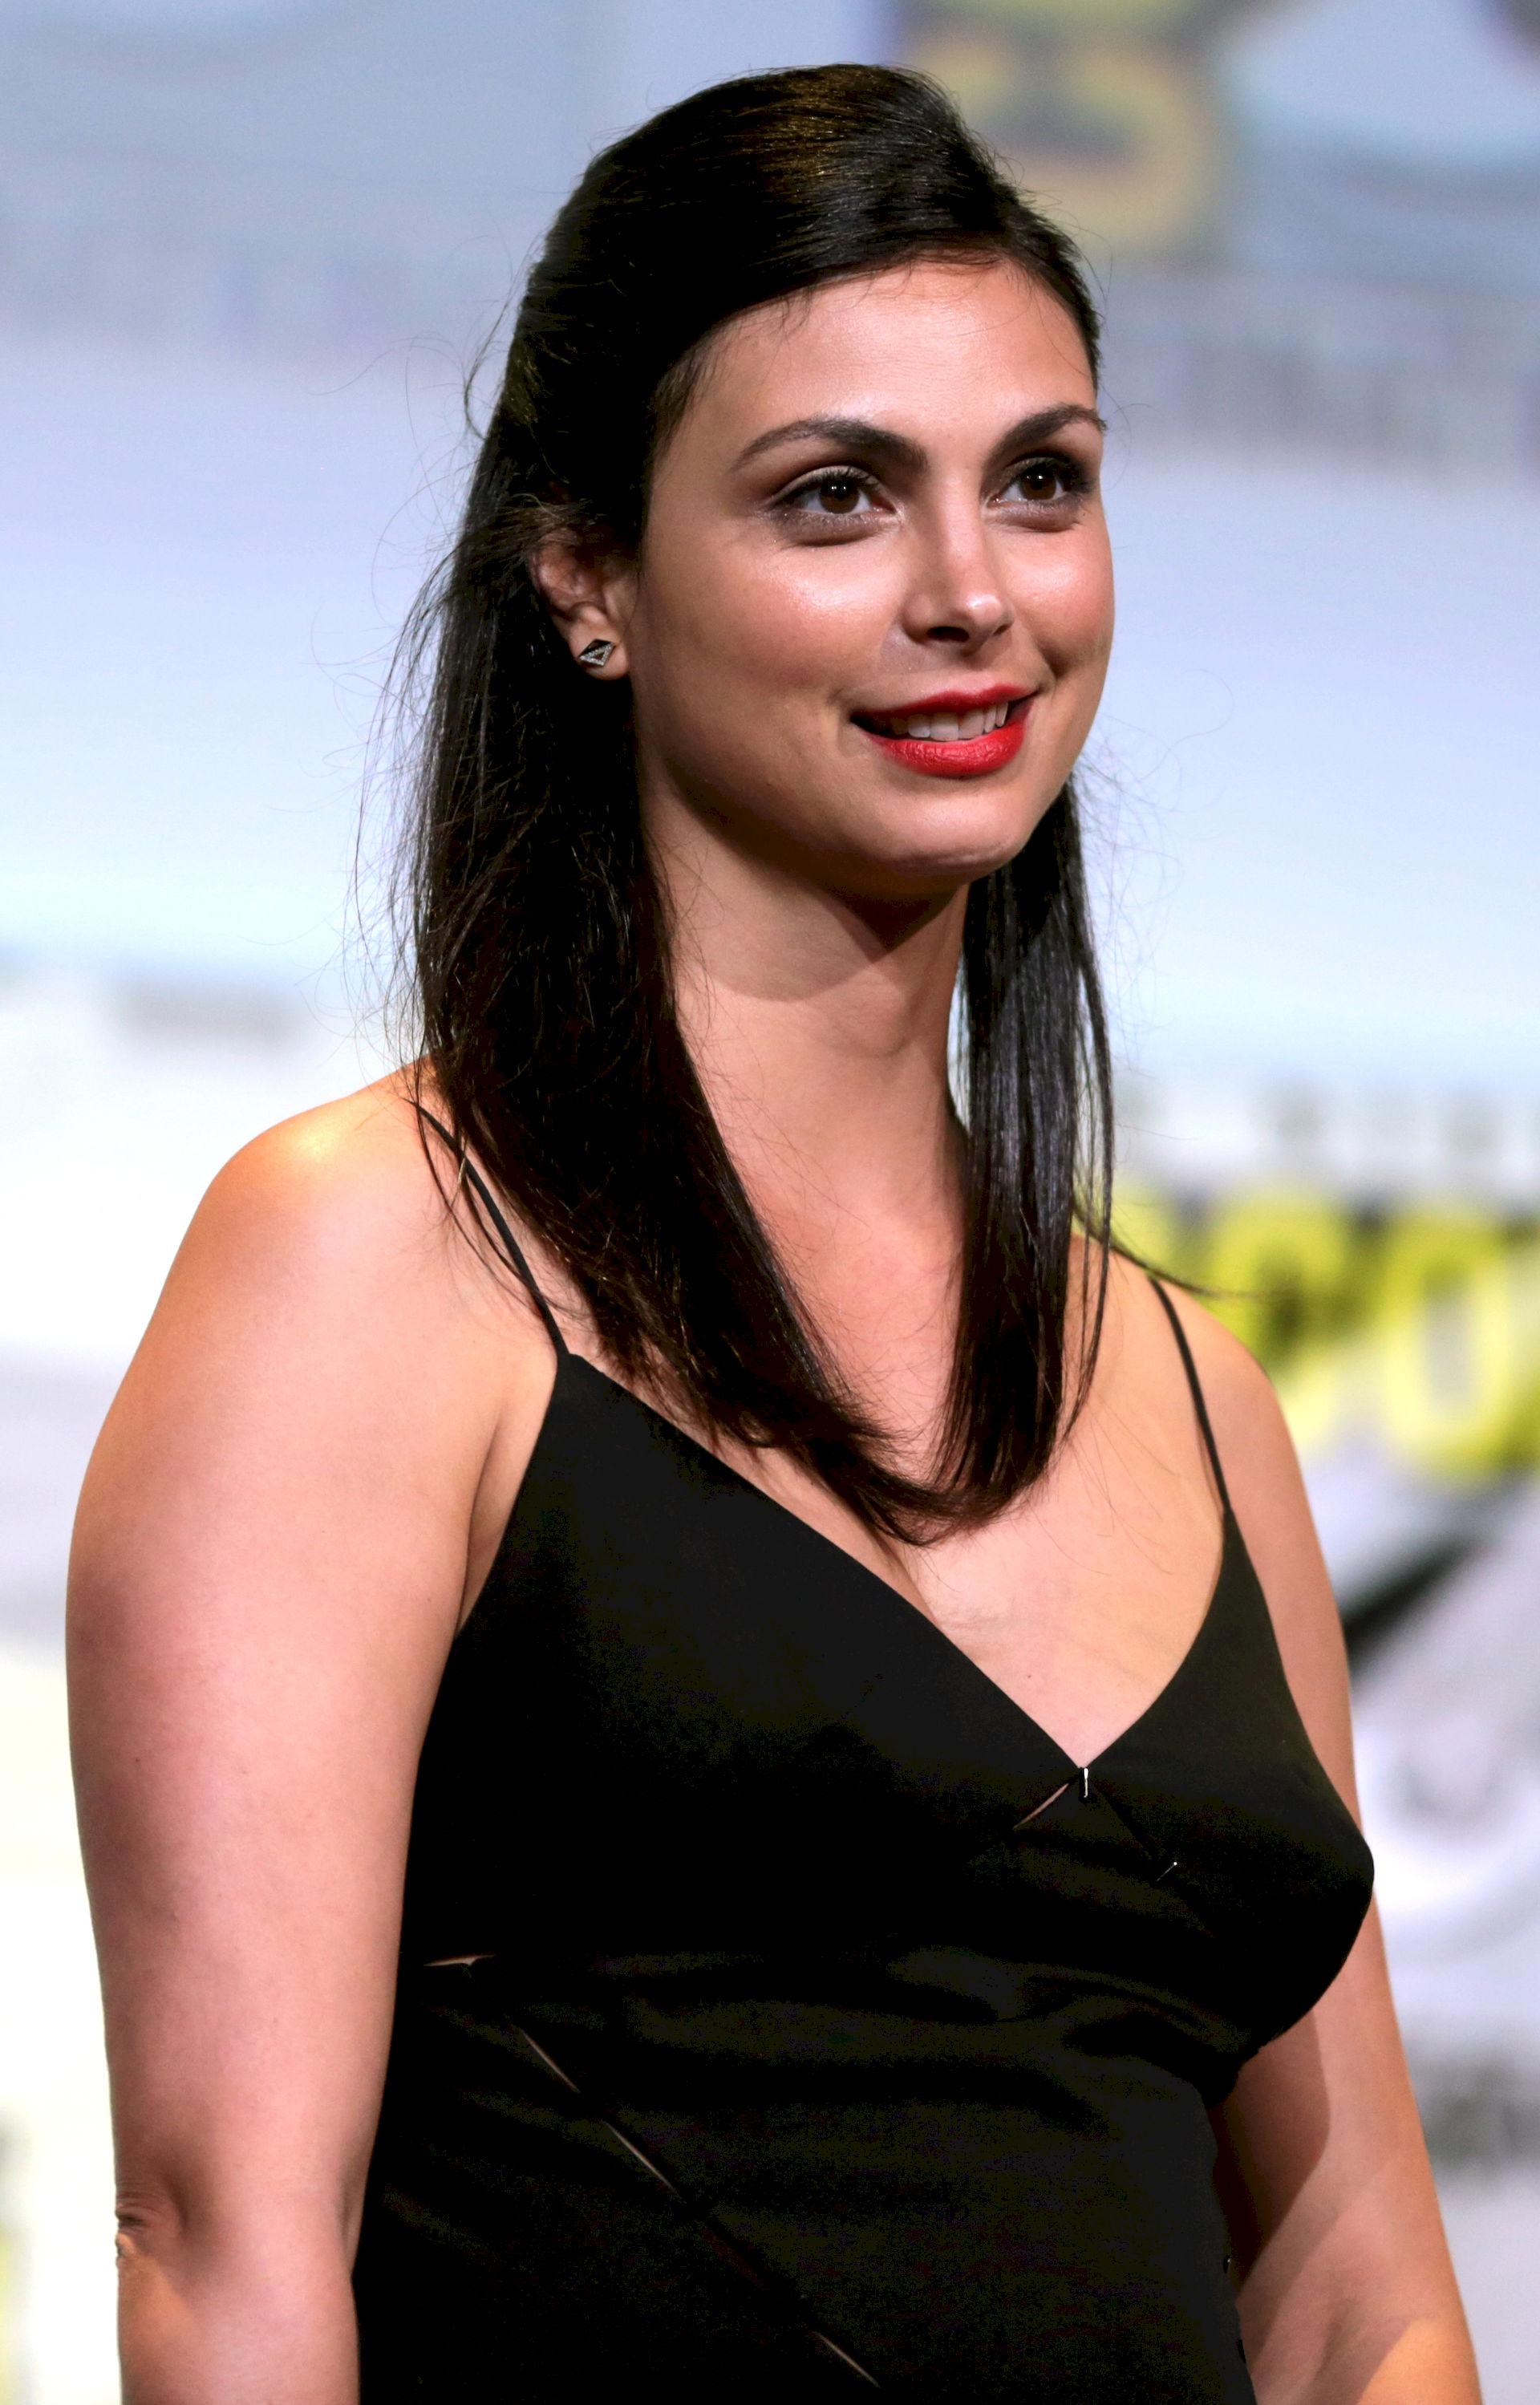 Photo of Morena Baccarin: Brazilian American actress